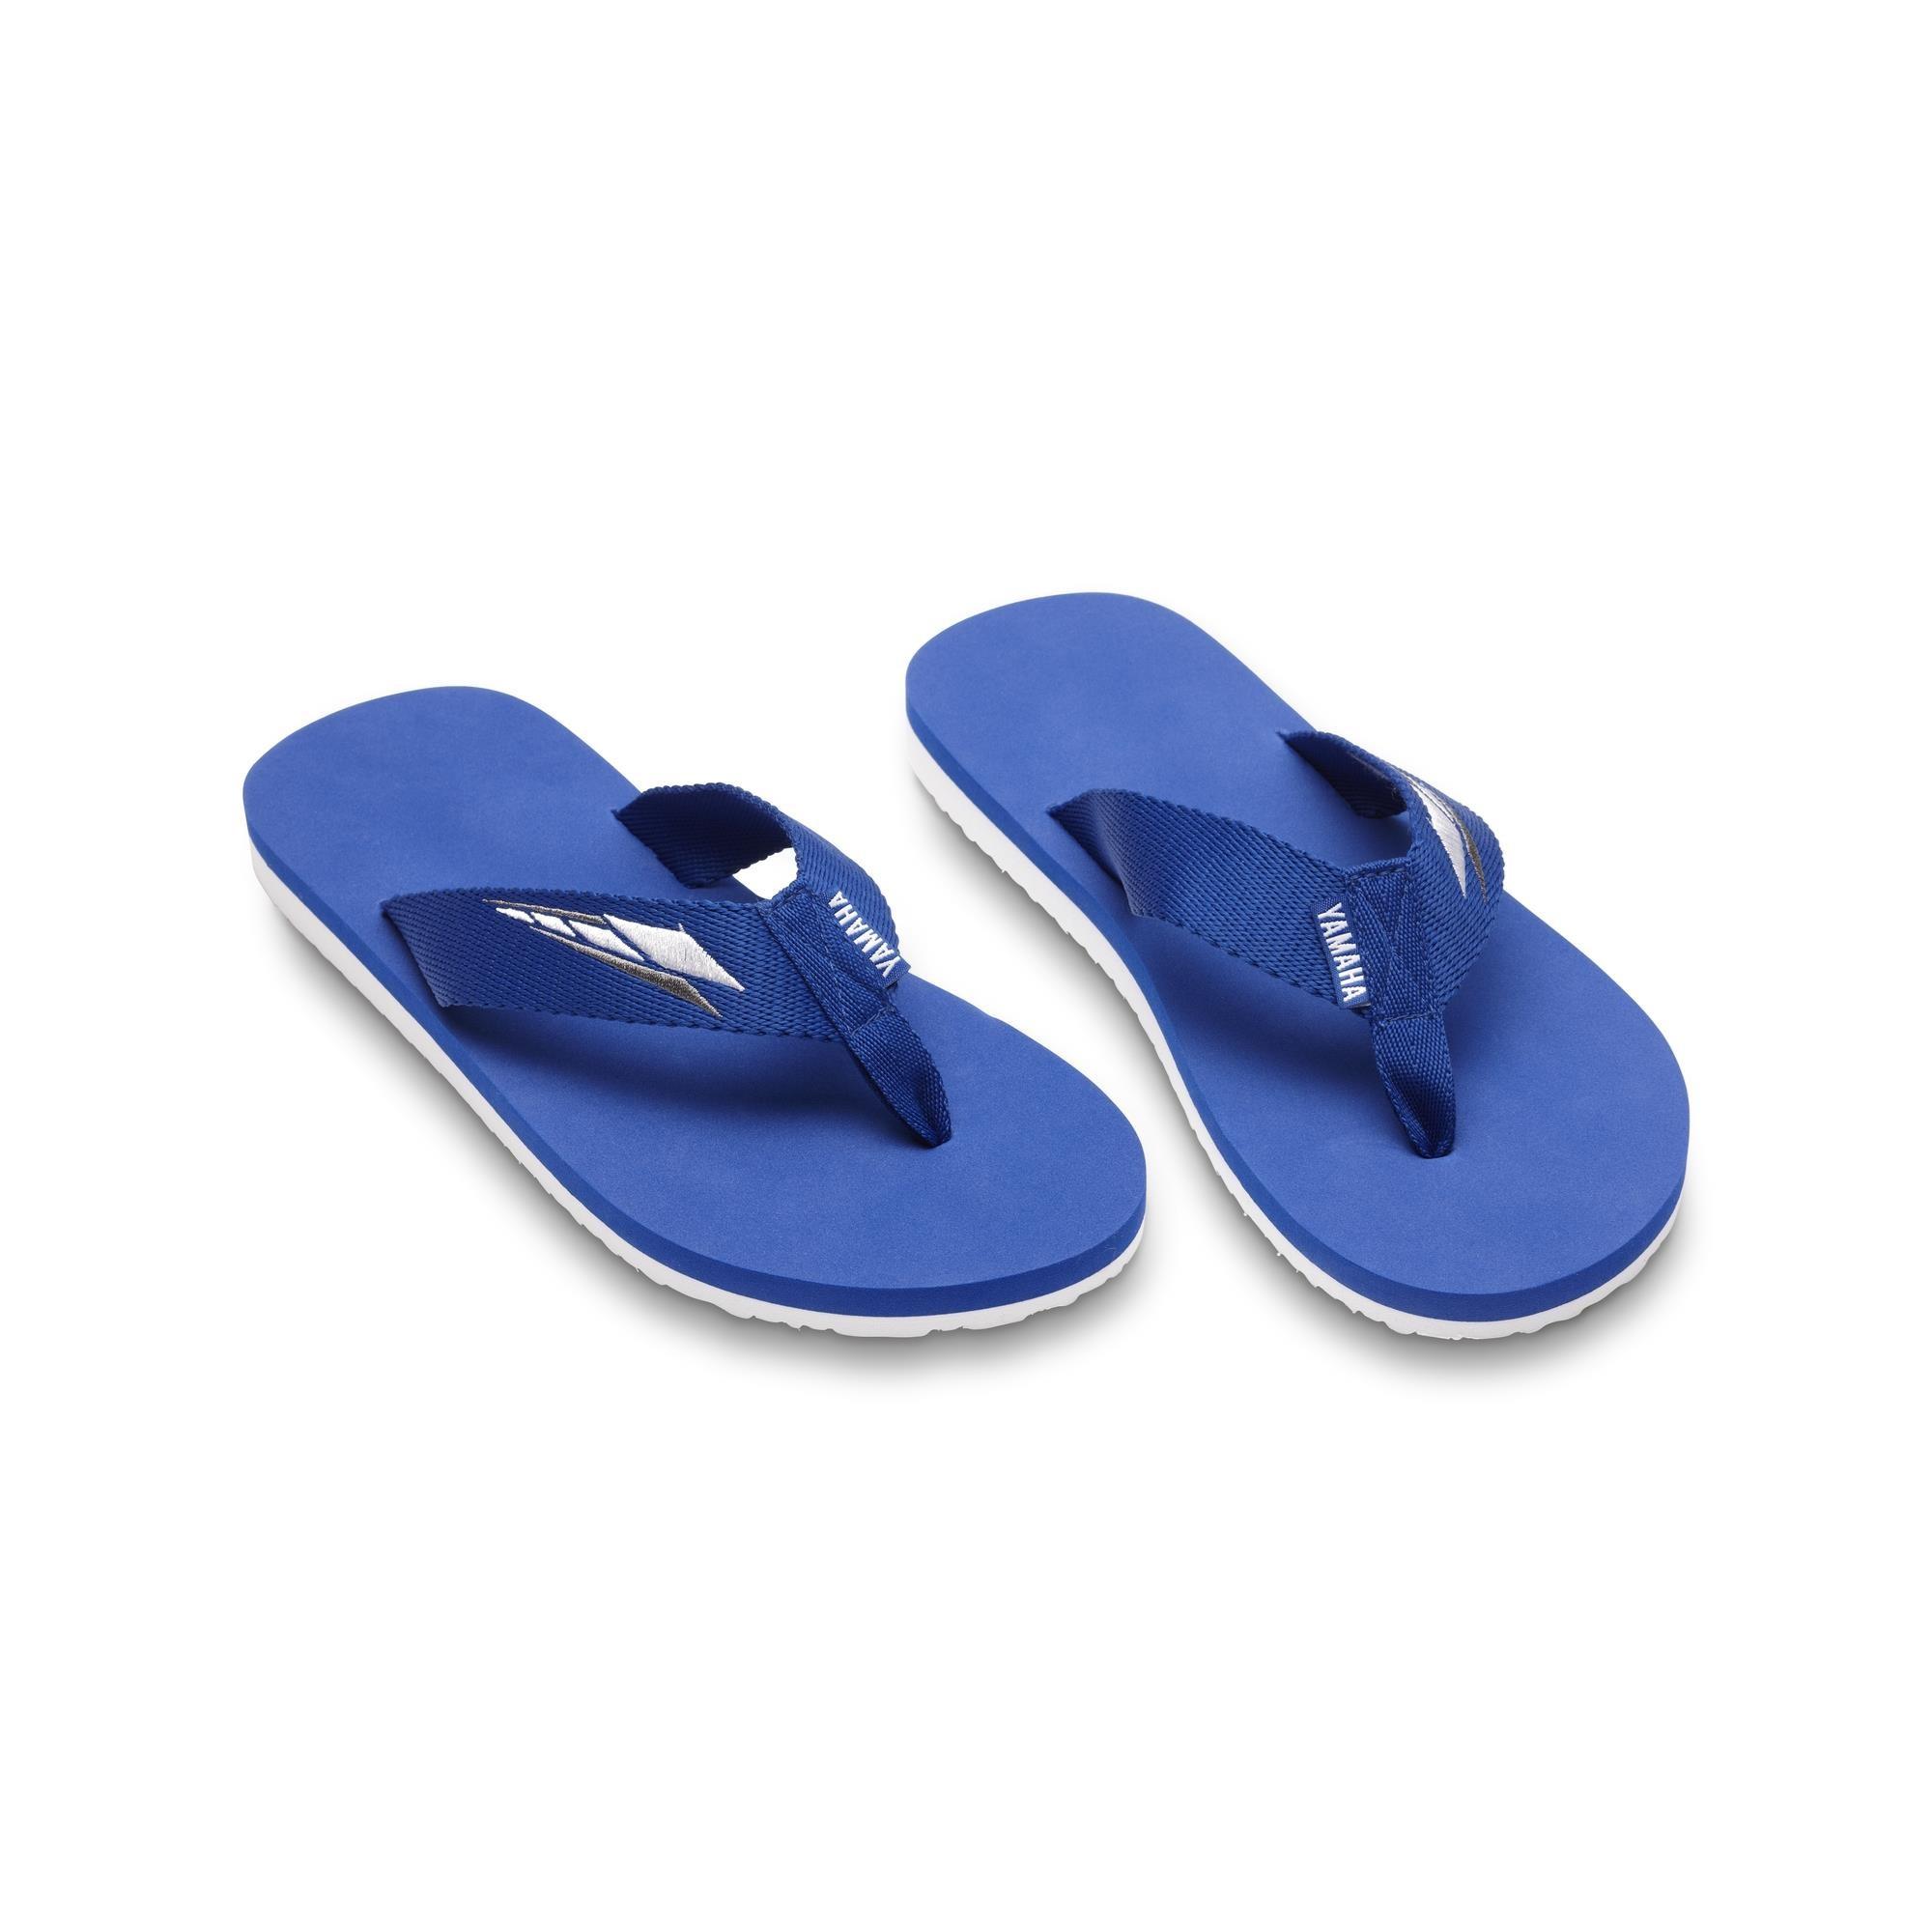 Sandalias Yamaha de color azul